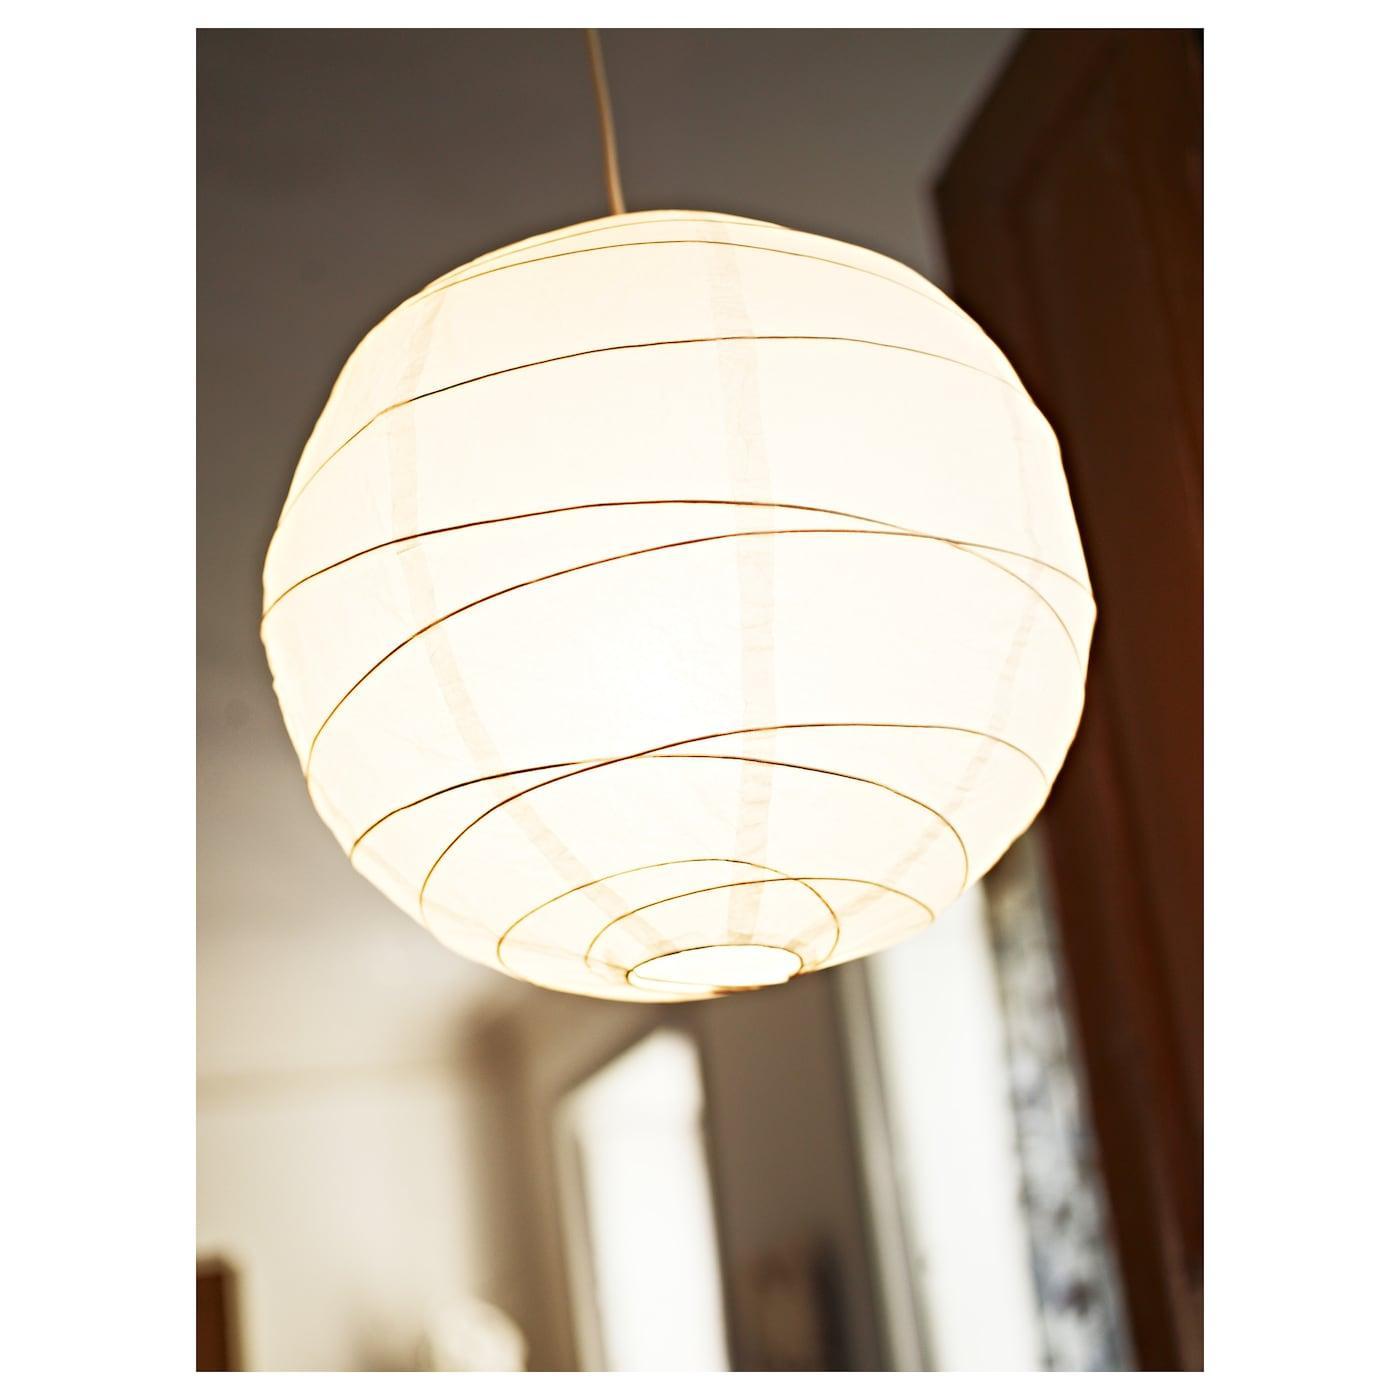 Ikea Lampe Papierschirm